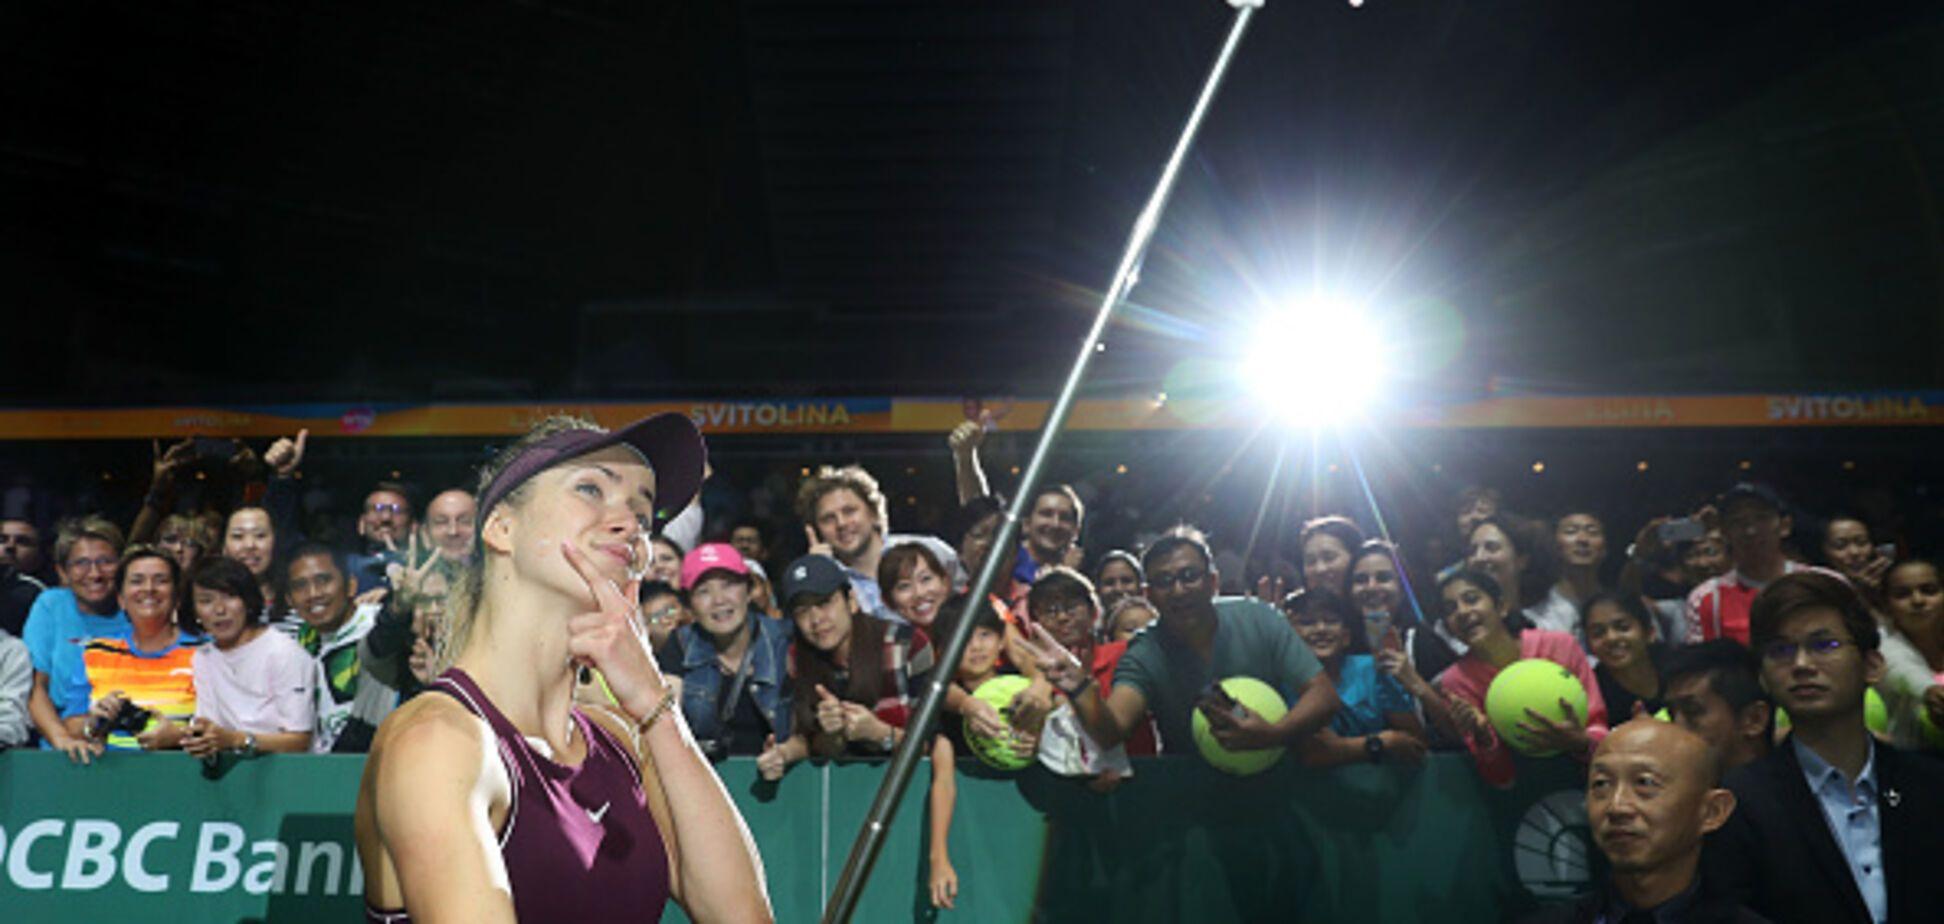 Свитолина - Стивенс: онлайн видеотрансляция финала Итогового турнира